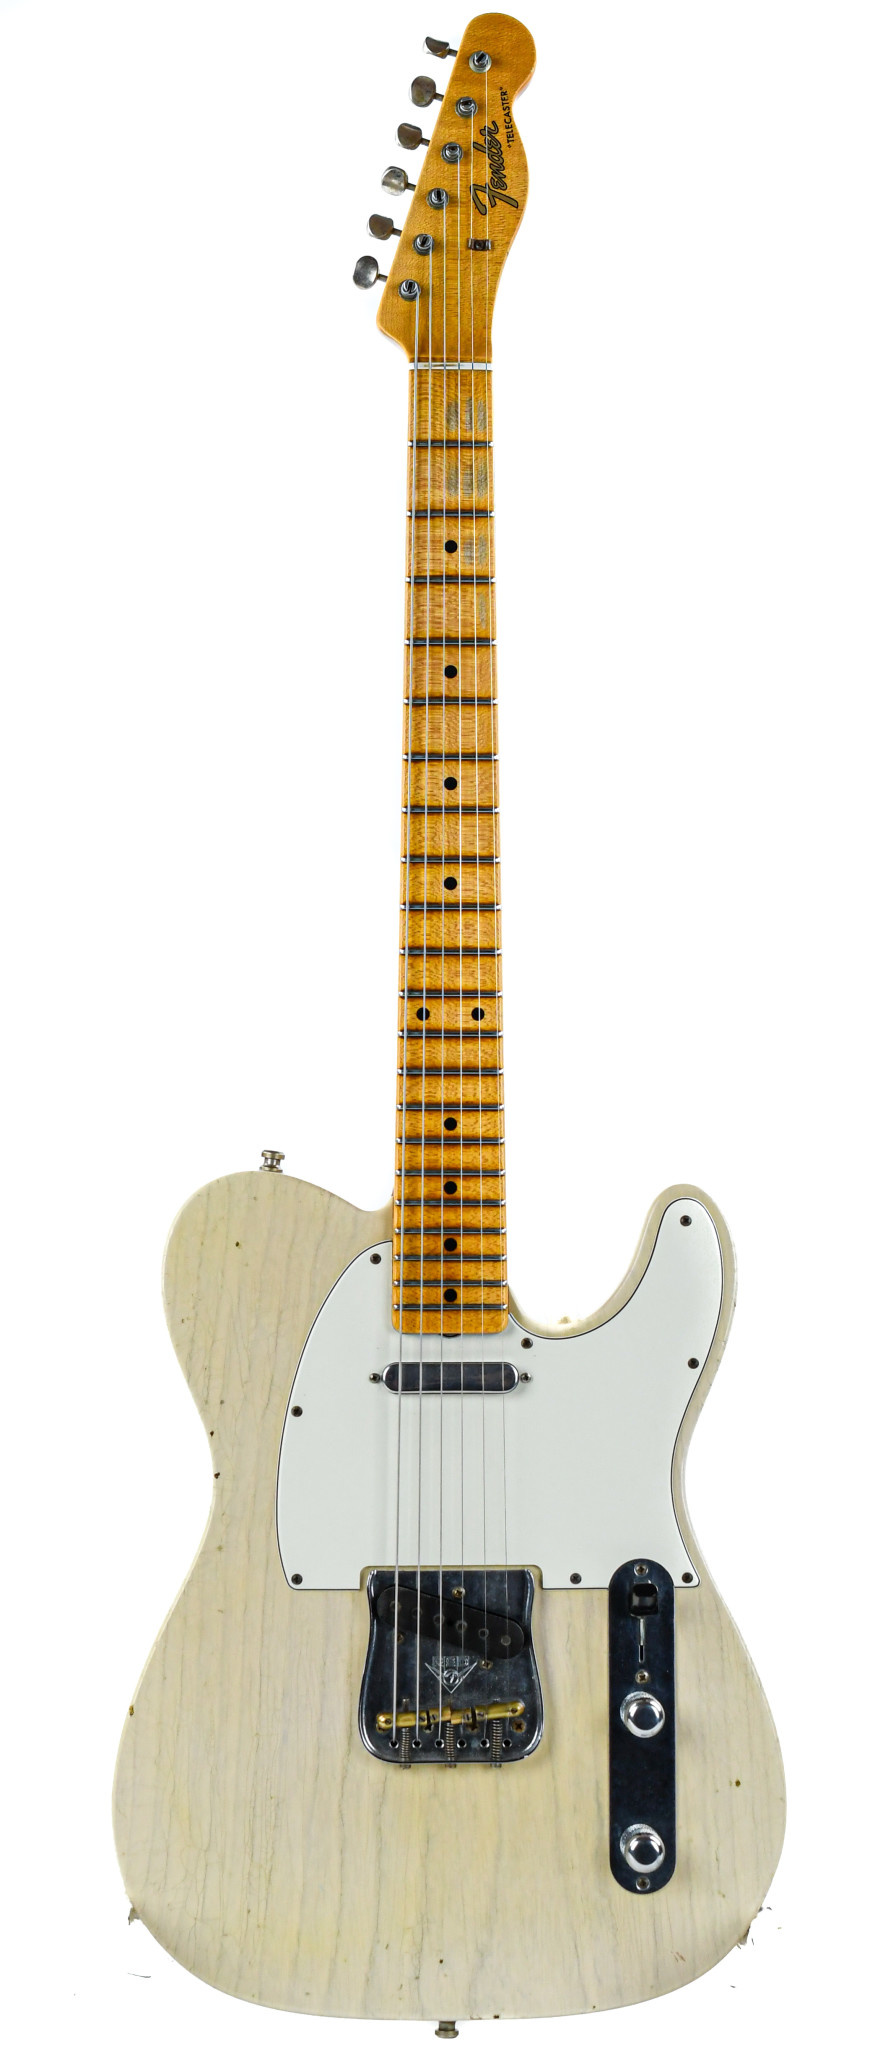 Fender Post Modern Telecaster Blonde Journeyman Relic 2015